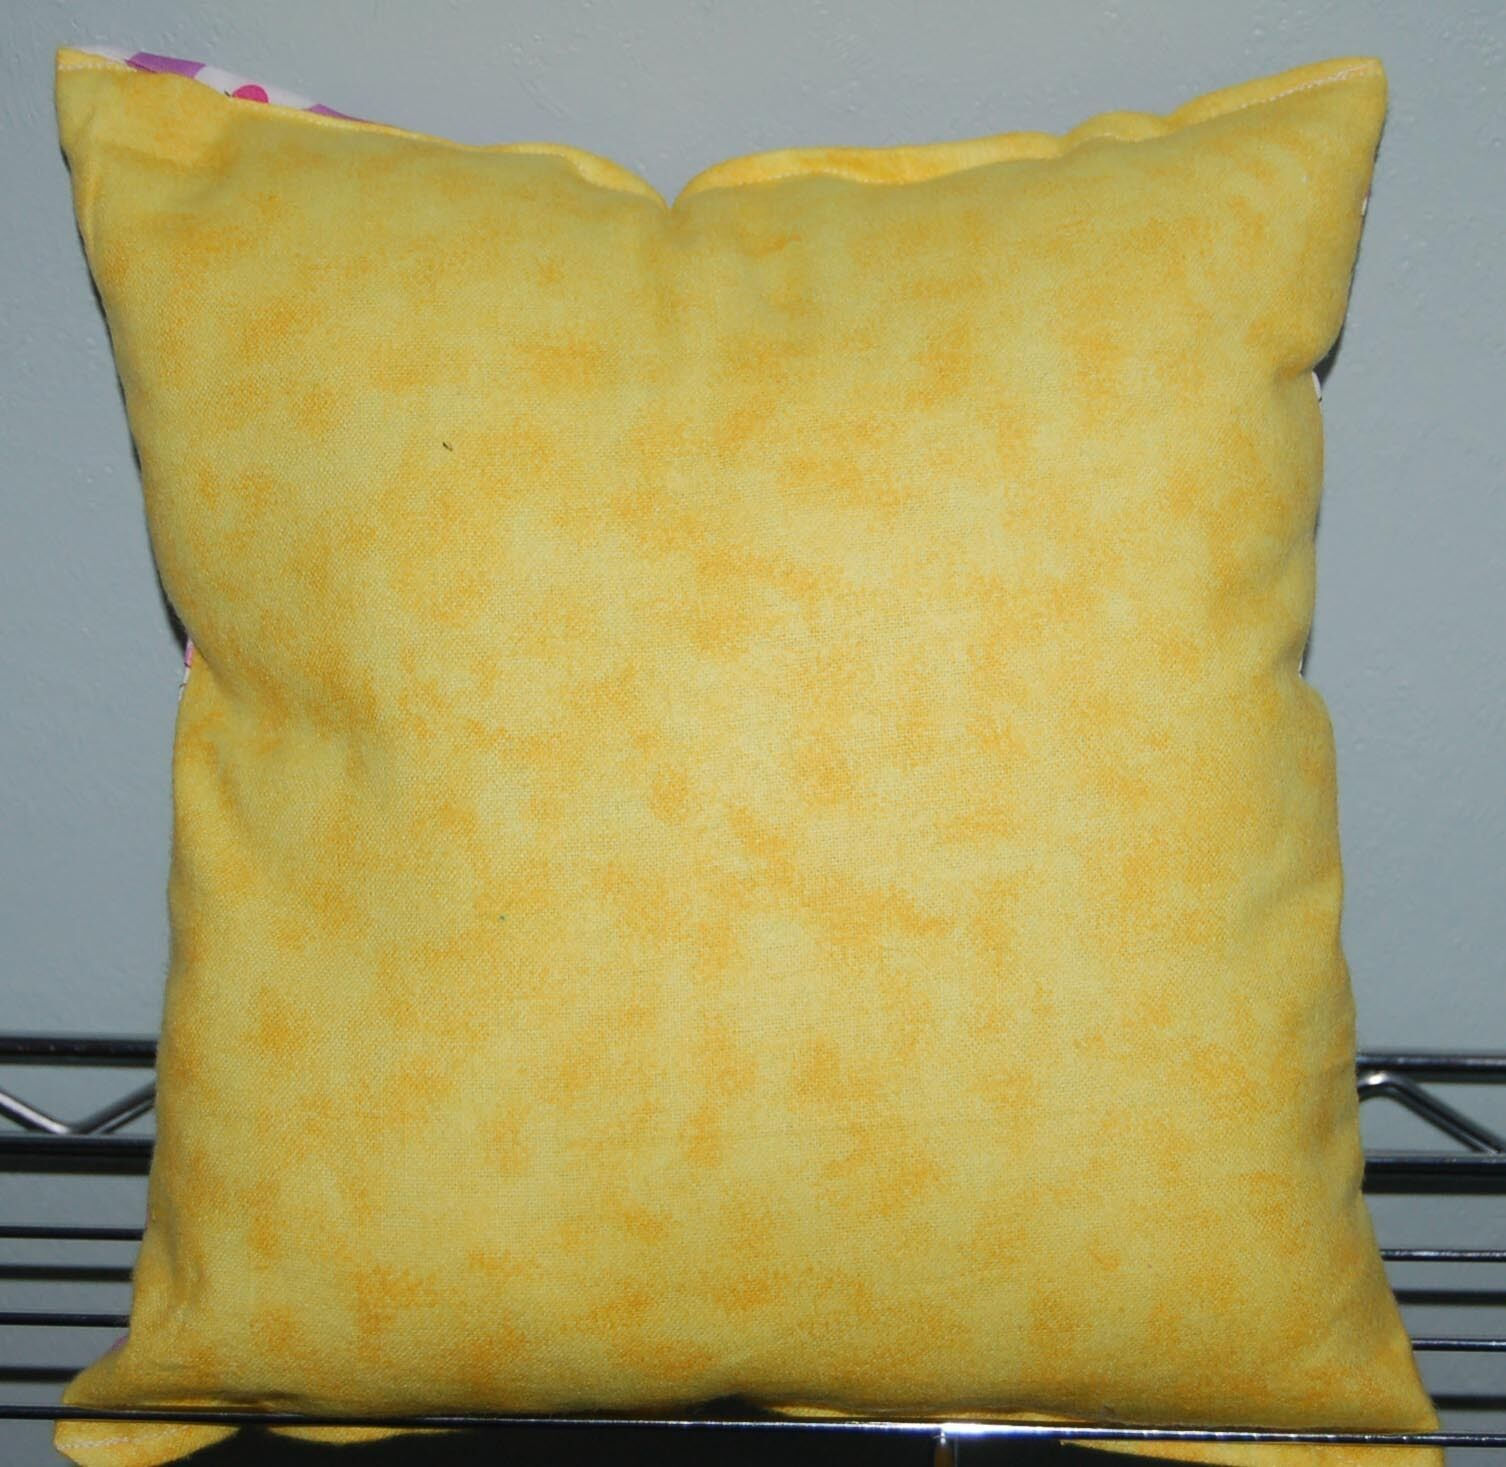 A's Pillow Oakland Athletics MLB Handmade in USA